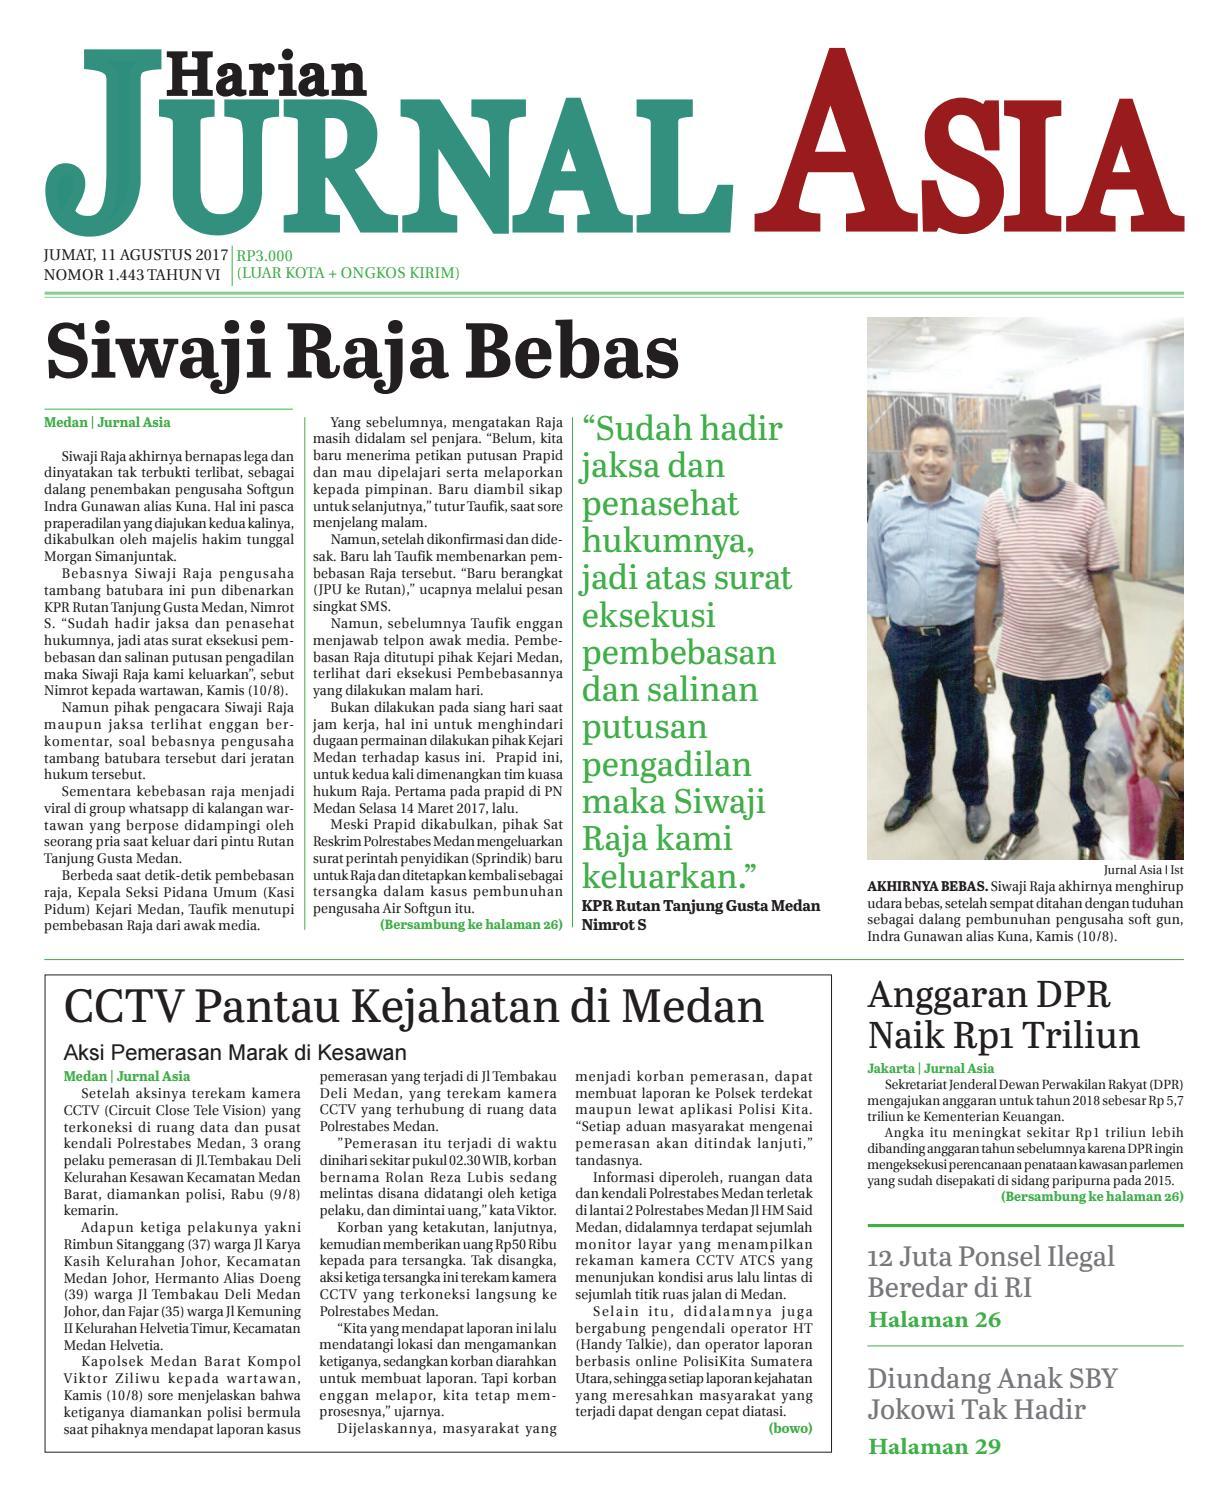 Harian Jurnal Asia Edisi Jumat 11 Agustus 2017 By Produk Ukm Bumn Tas Phiton Kembang Orchid Medan Issuu